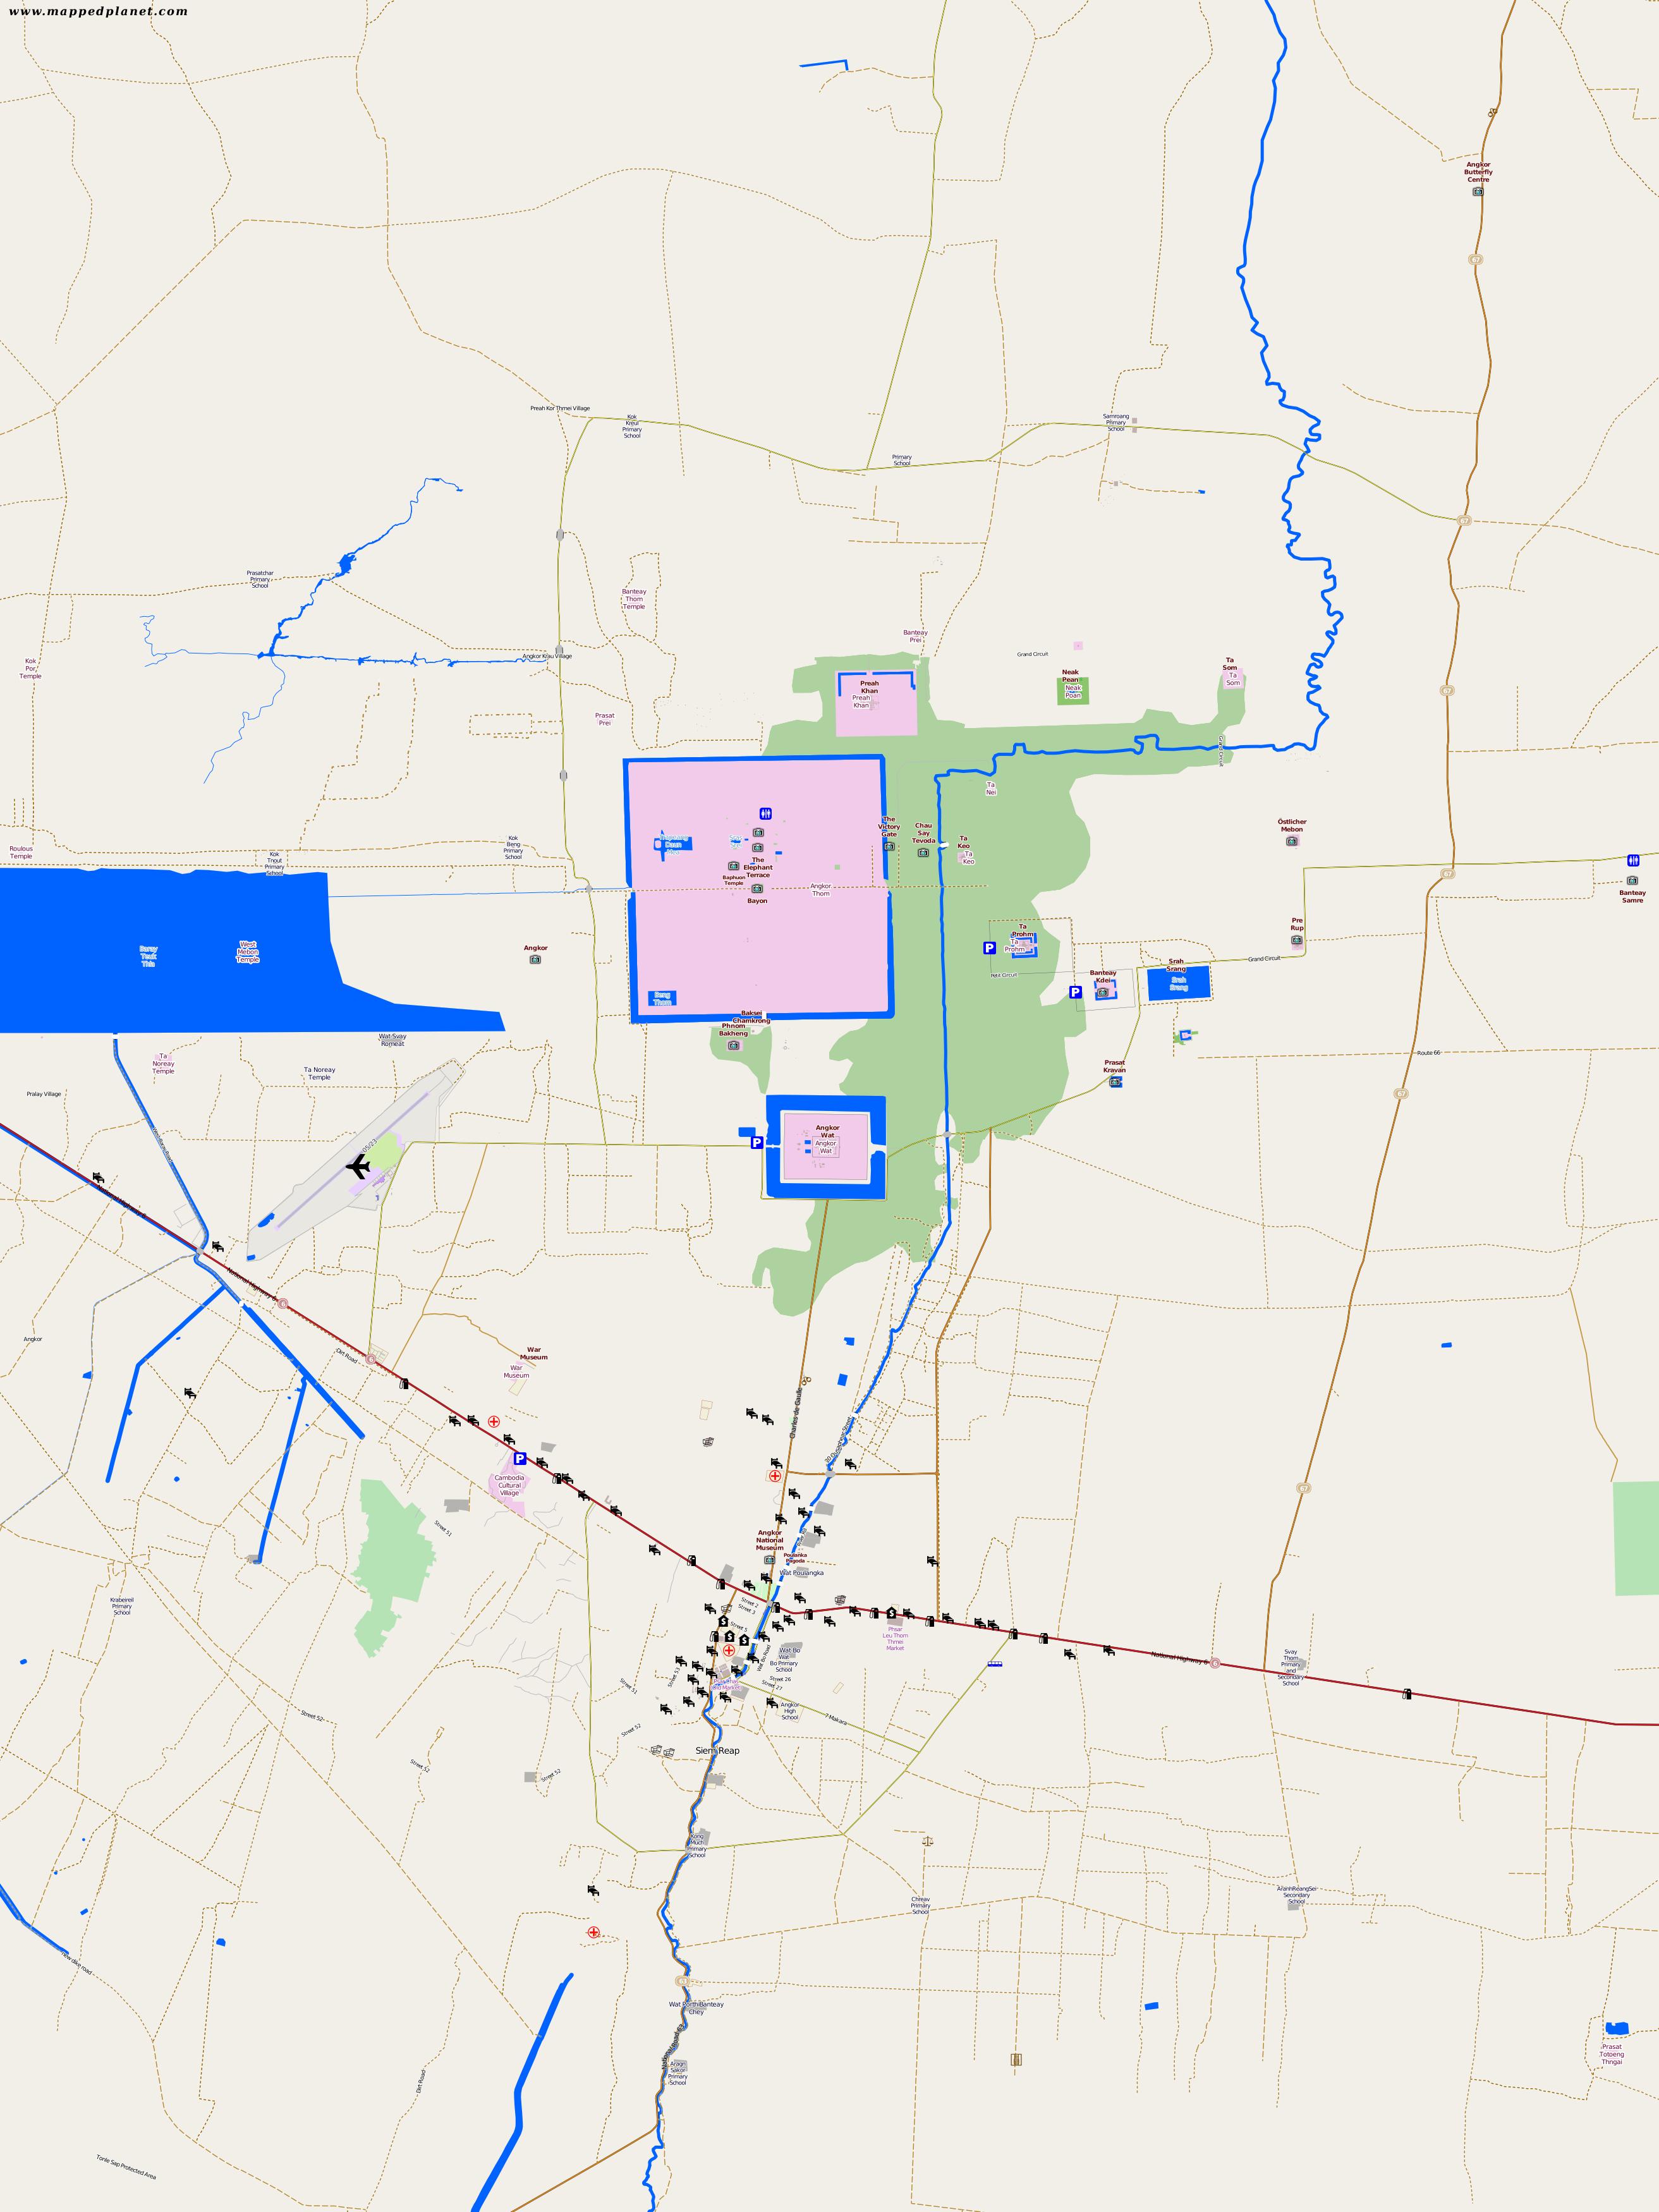 Angkor Wat Karte.City Maps Angkor Wat